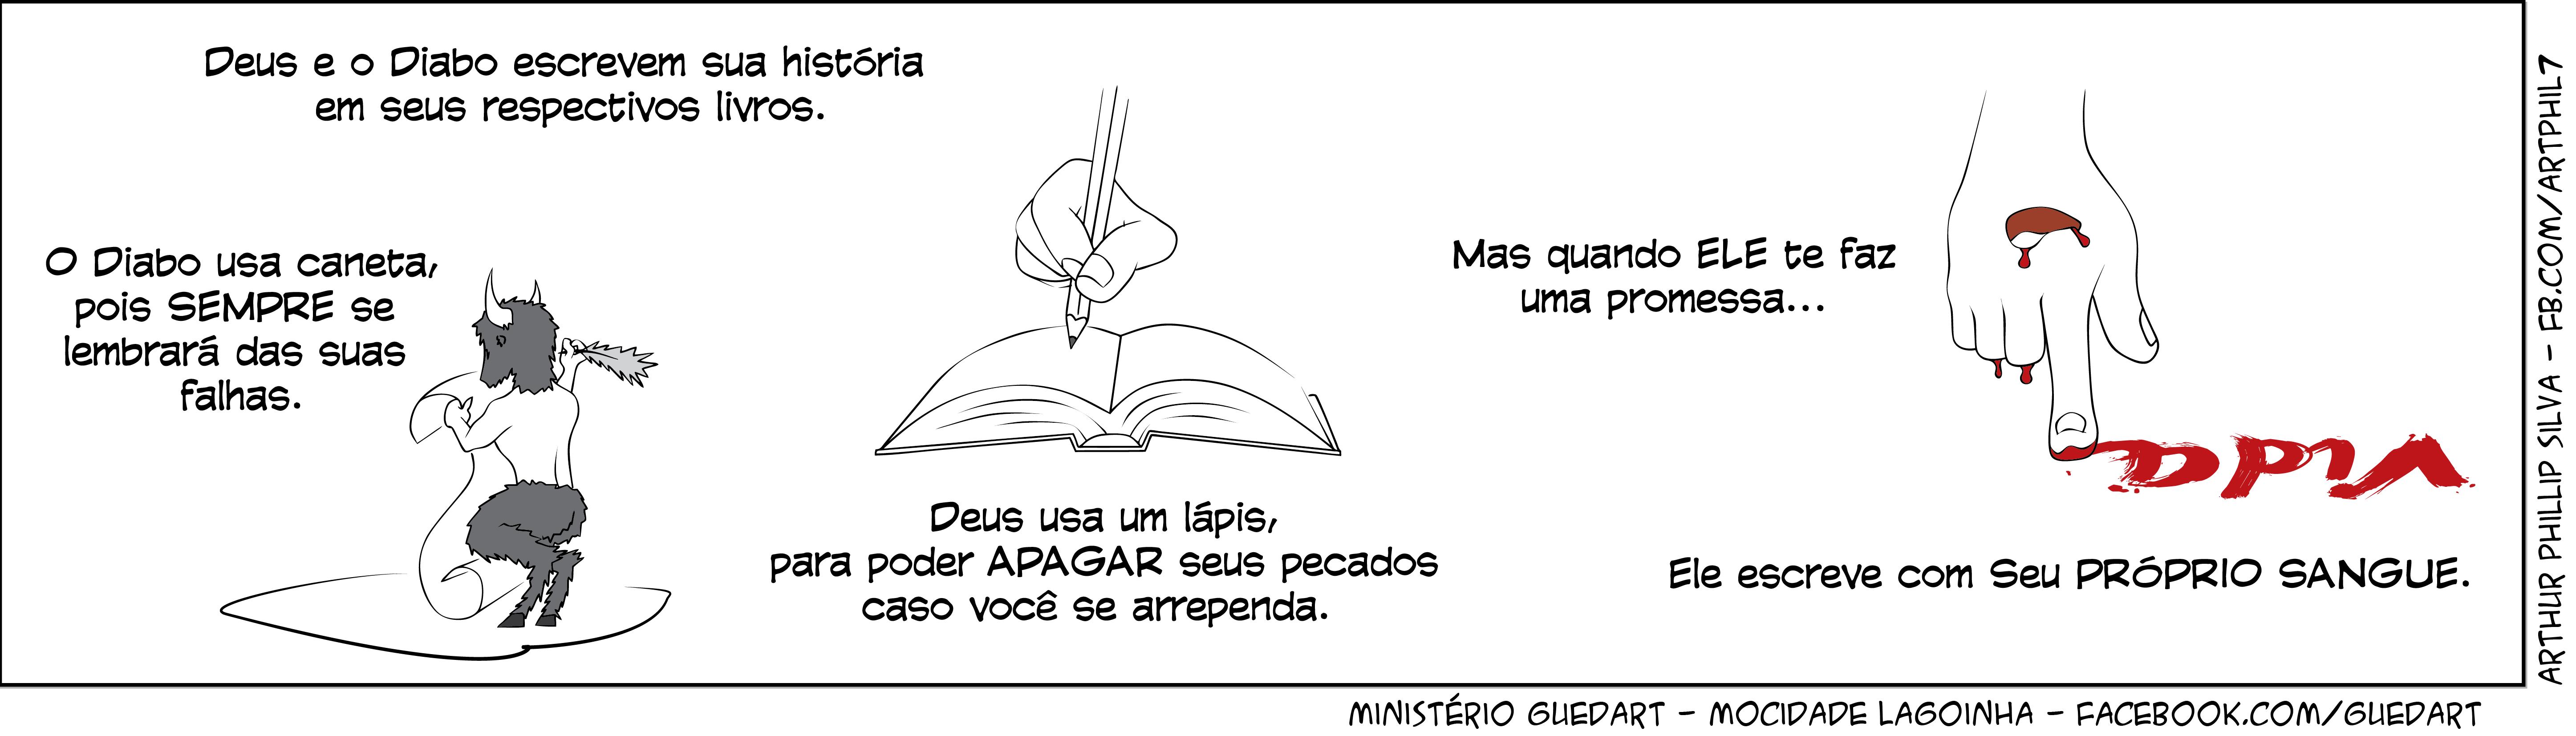 Historias-02